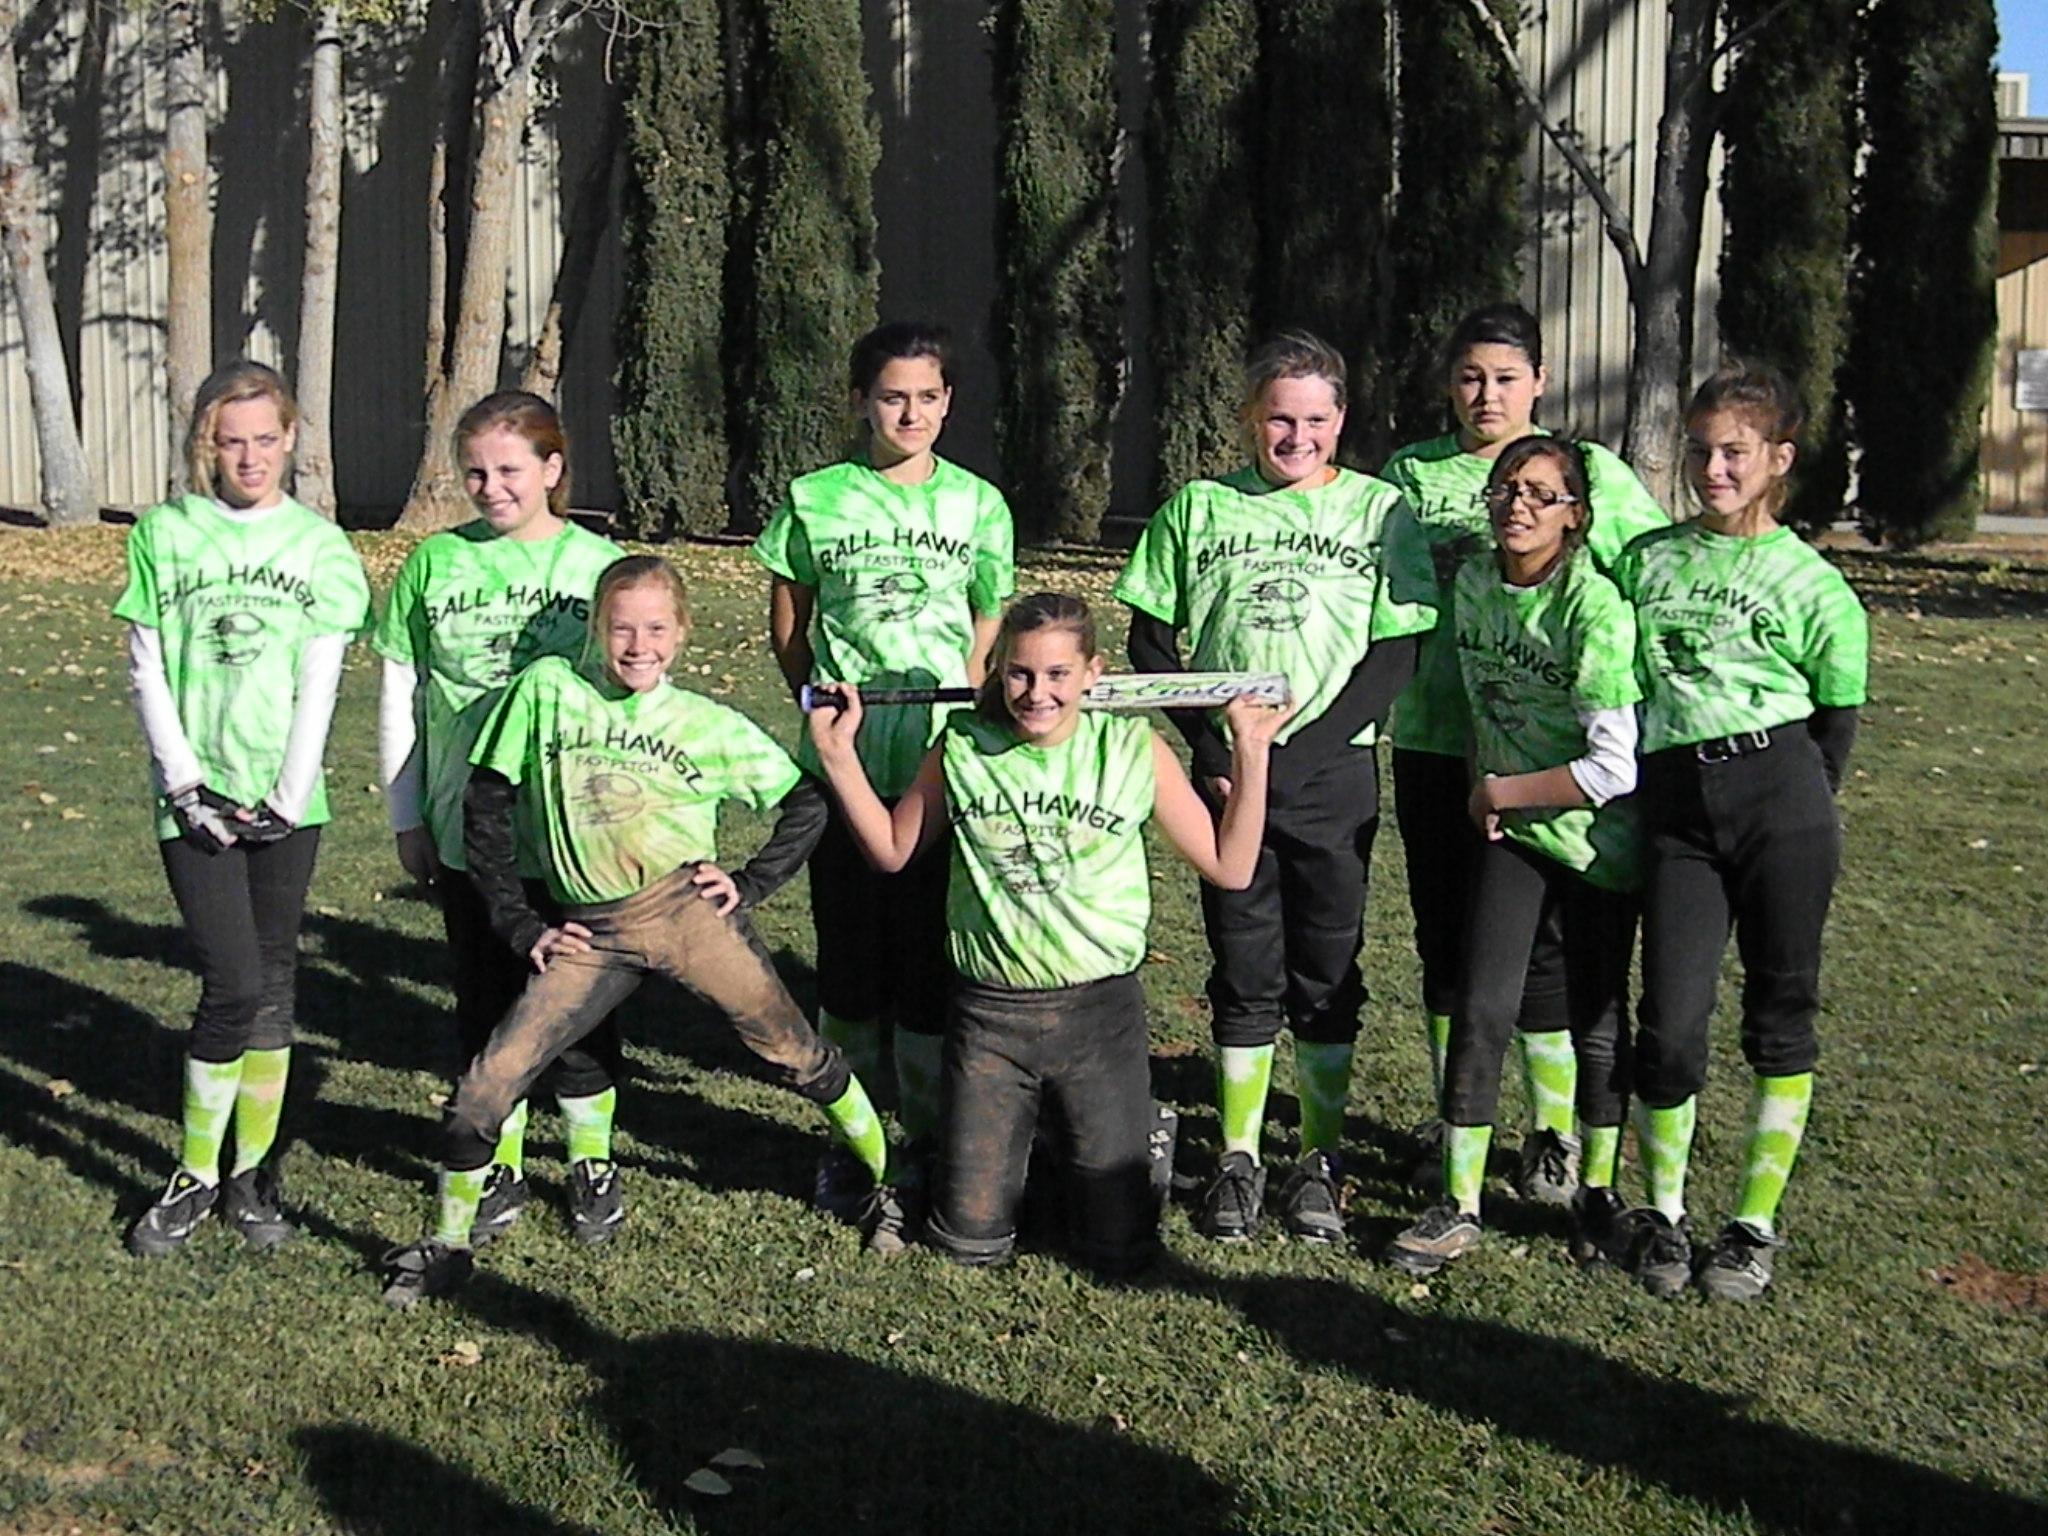 Softball Jersey Design Ideas womens custom all about that base softball shirt with free monogram Girls Softball T Shirt Photo